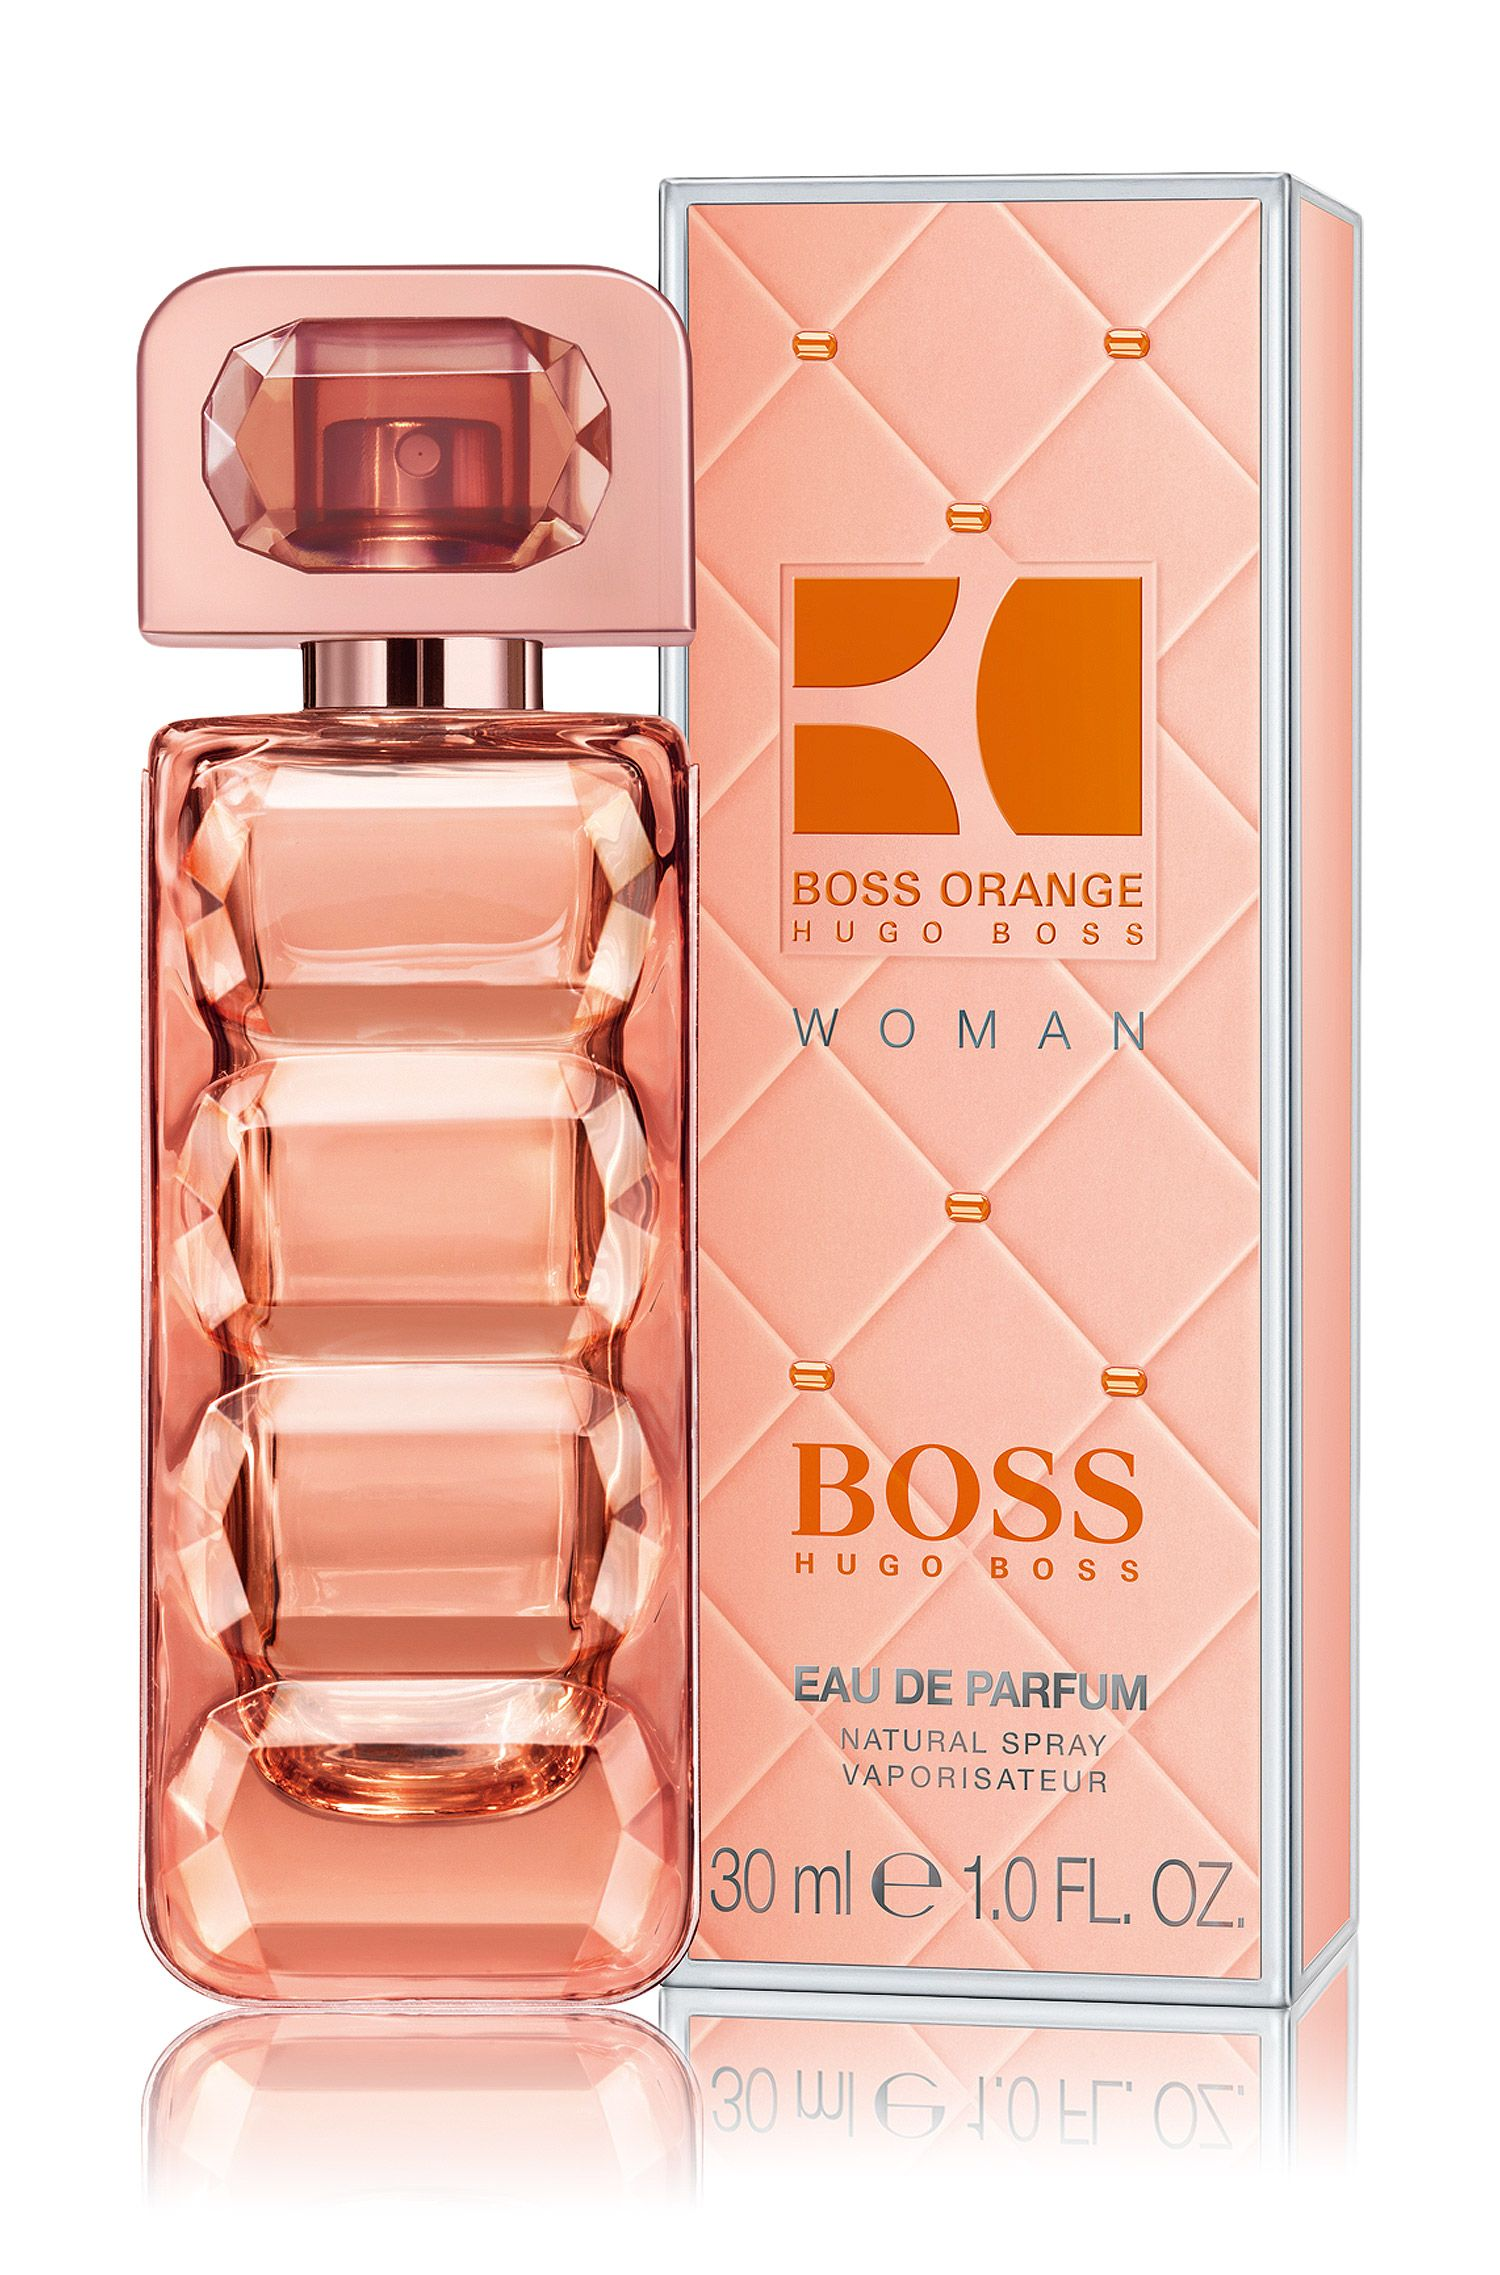 BOSS Orange Woman Eau de Parfum 30 ml